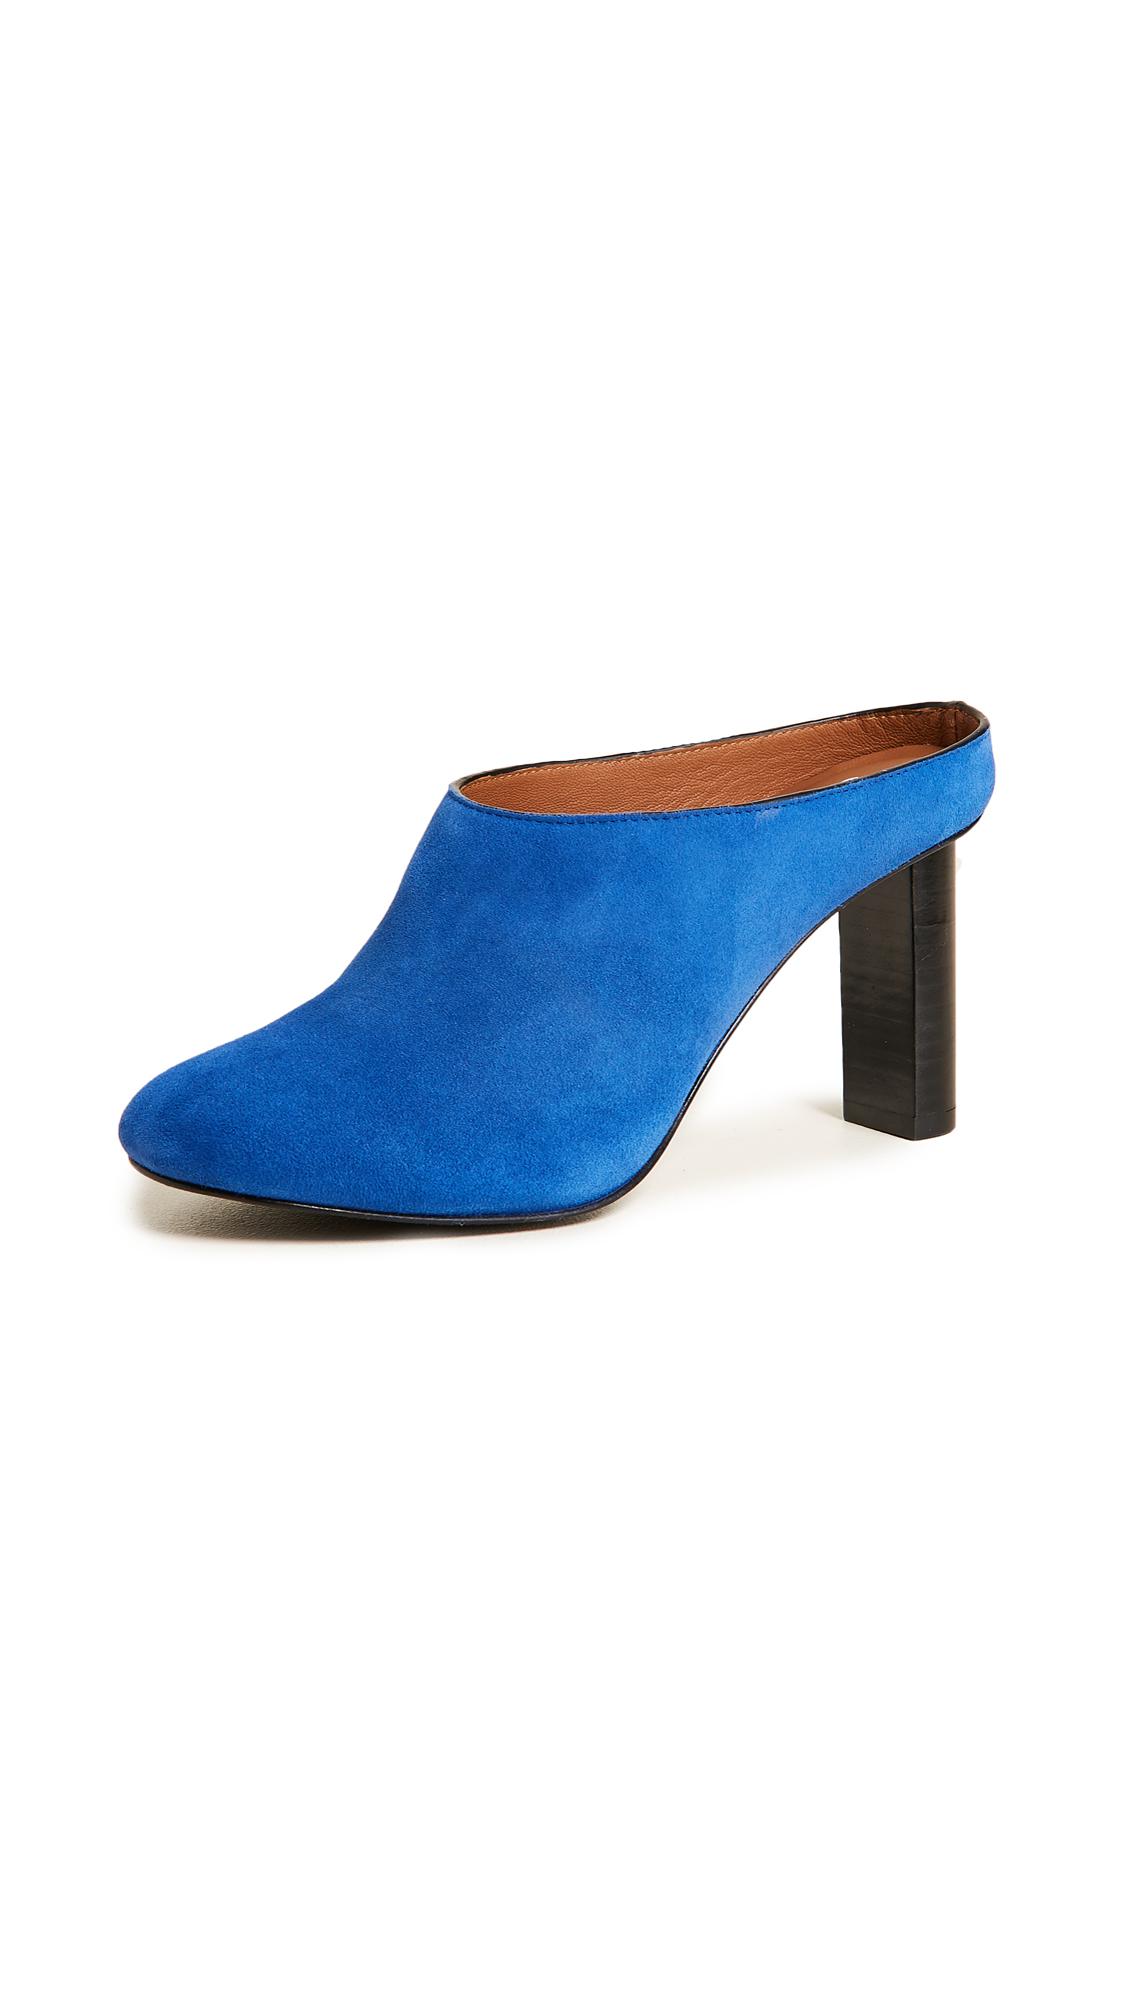 Joseph High Bardot Mules - Bright Blue